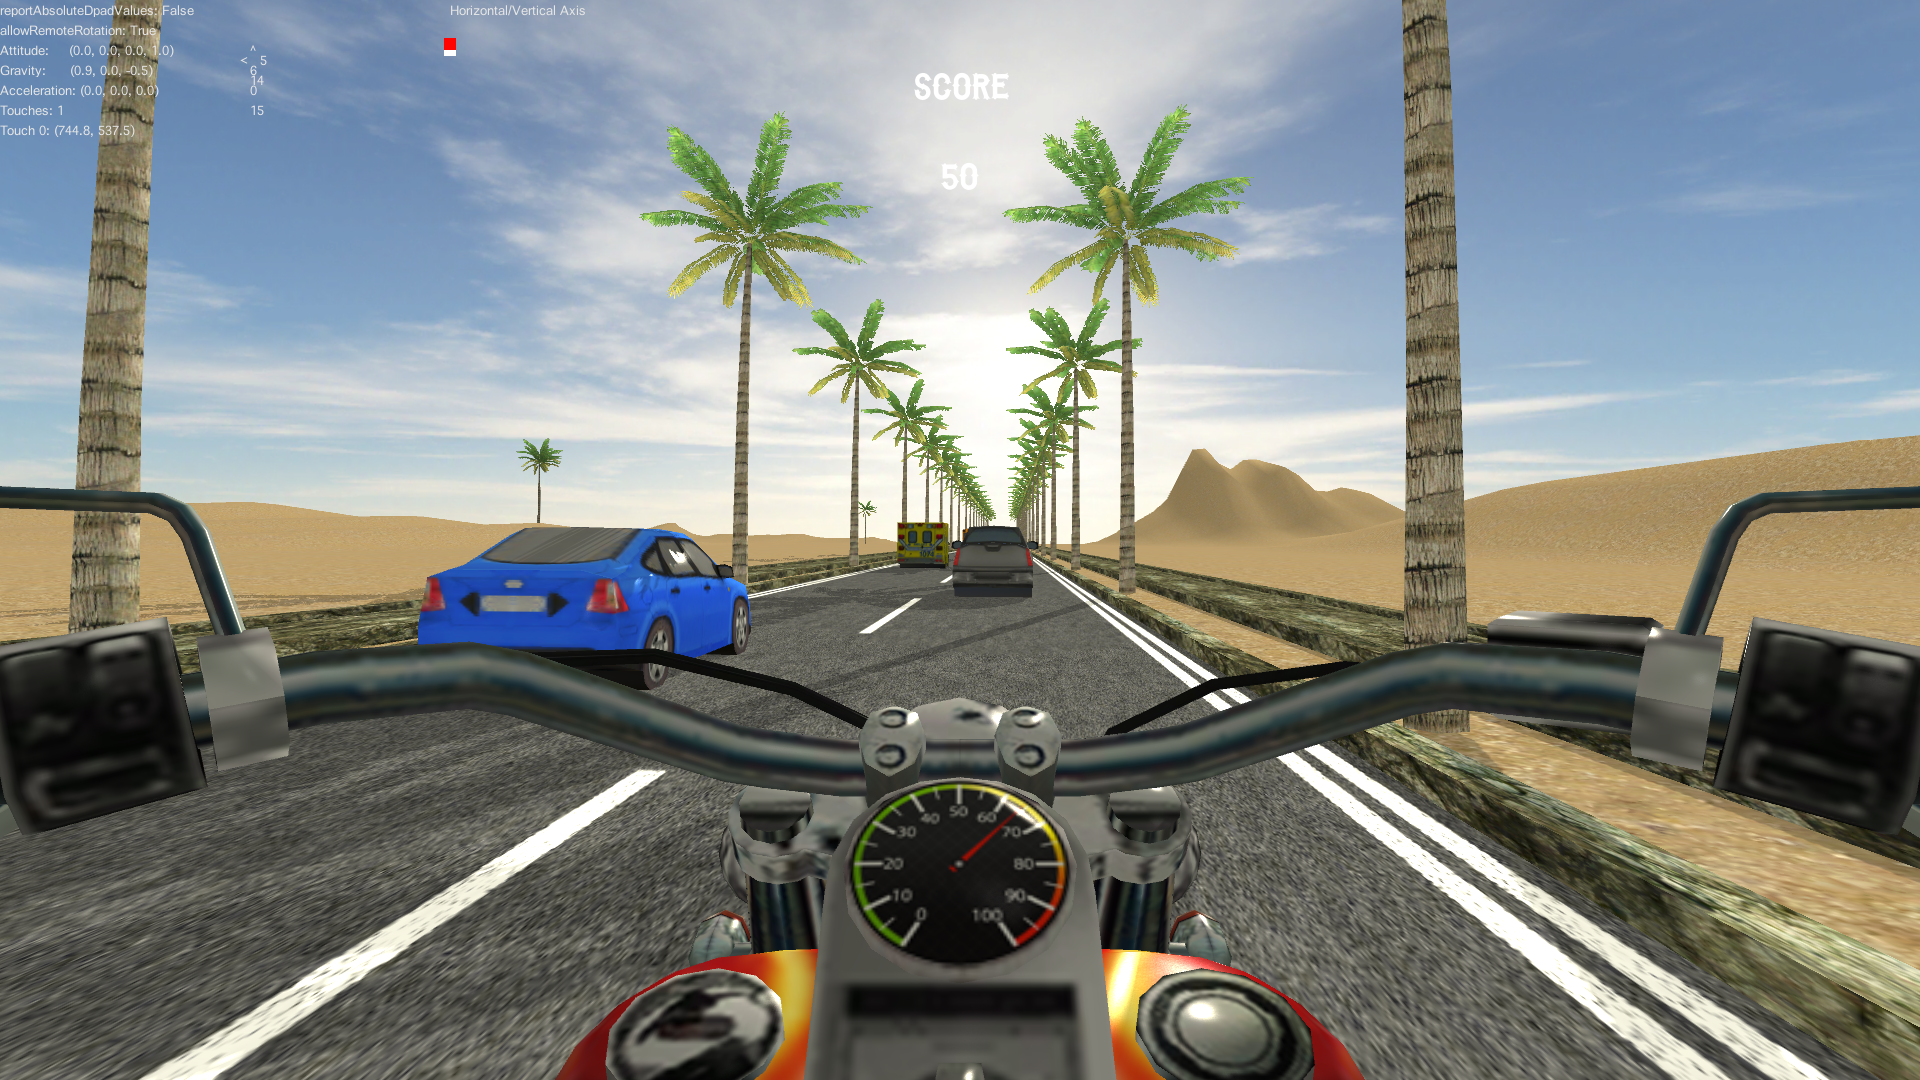 Biker Run screenshot 4